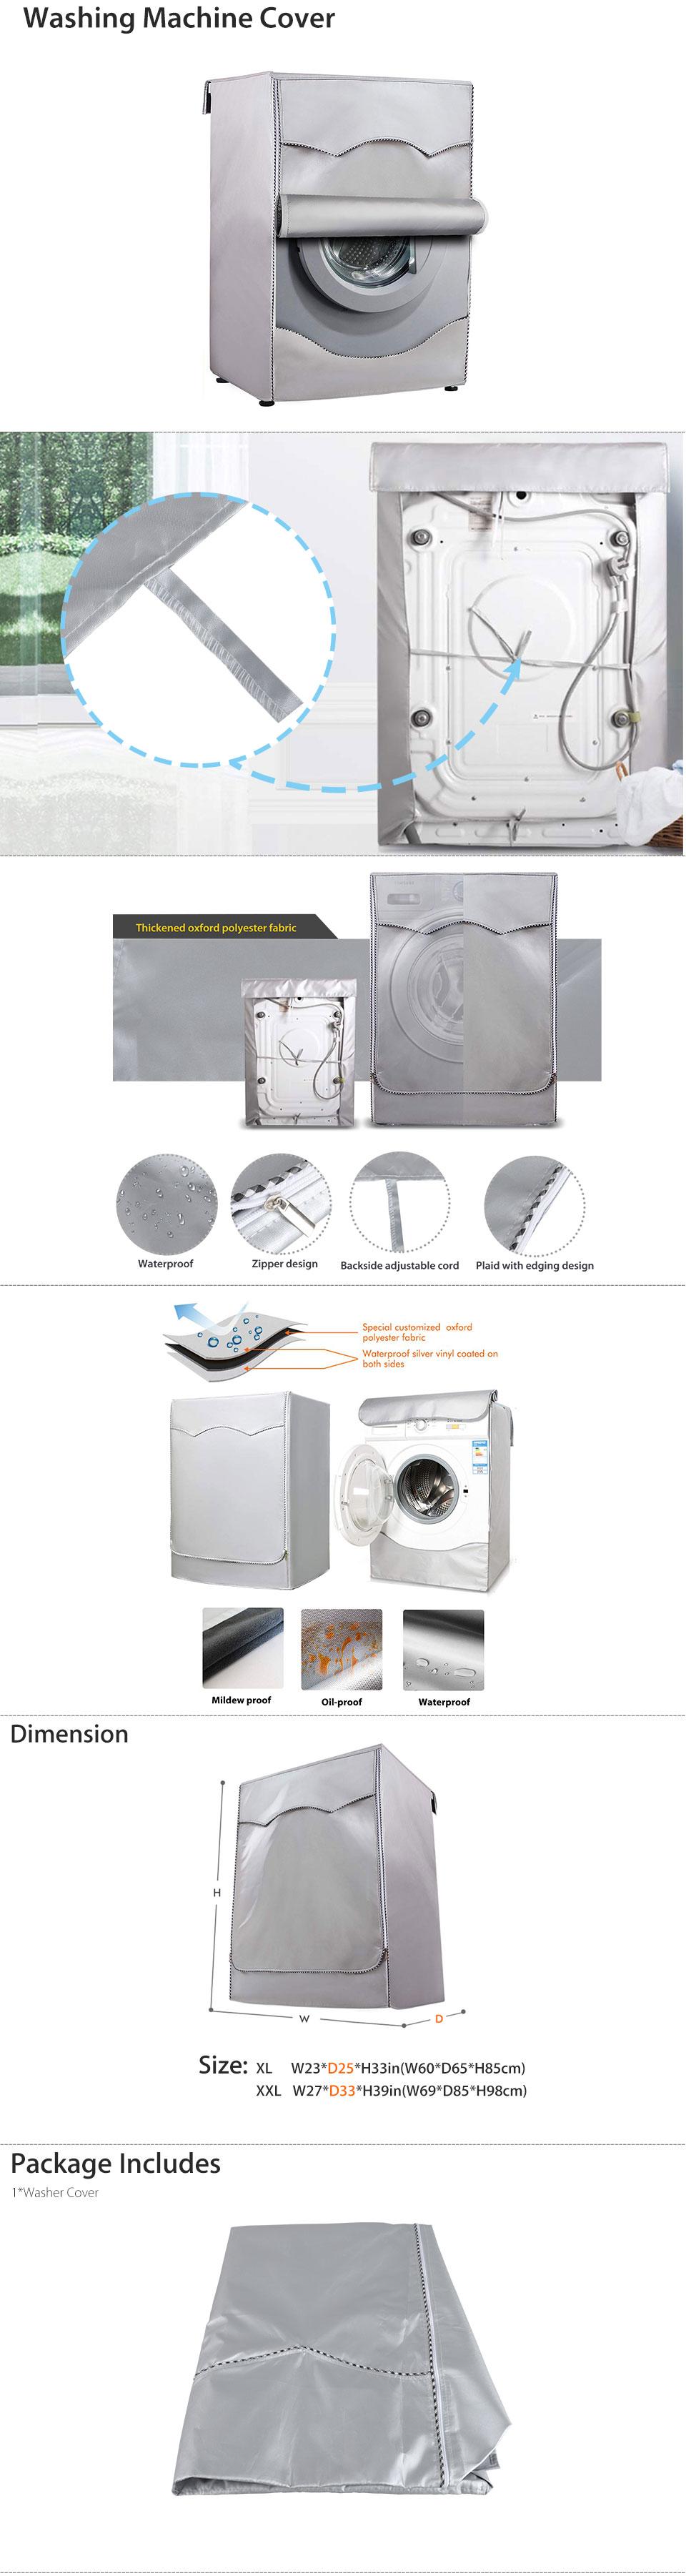 ghdonat.com Washers & Dryers Appliances Washer Cover Drum Washing ...